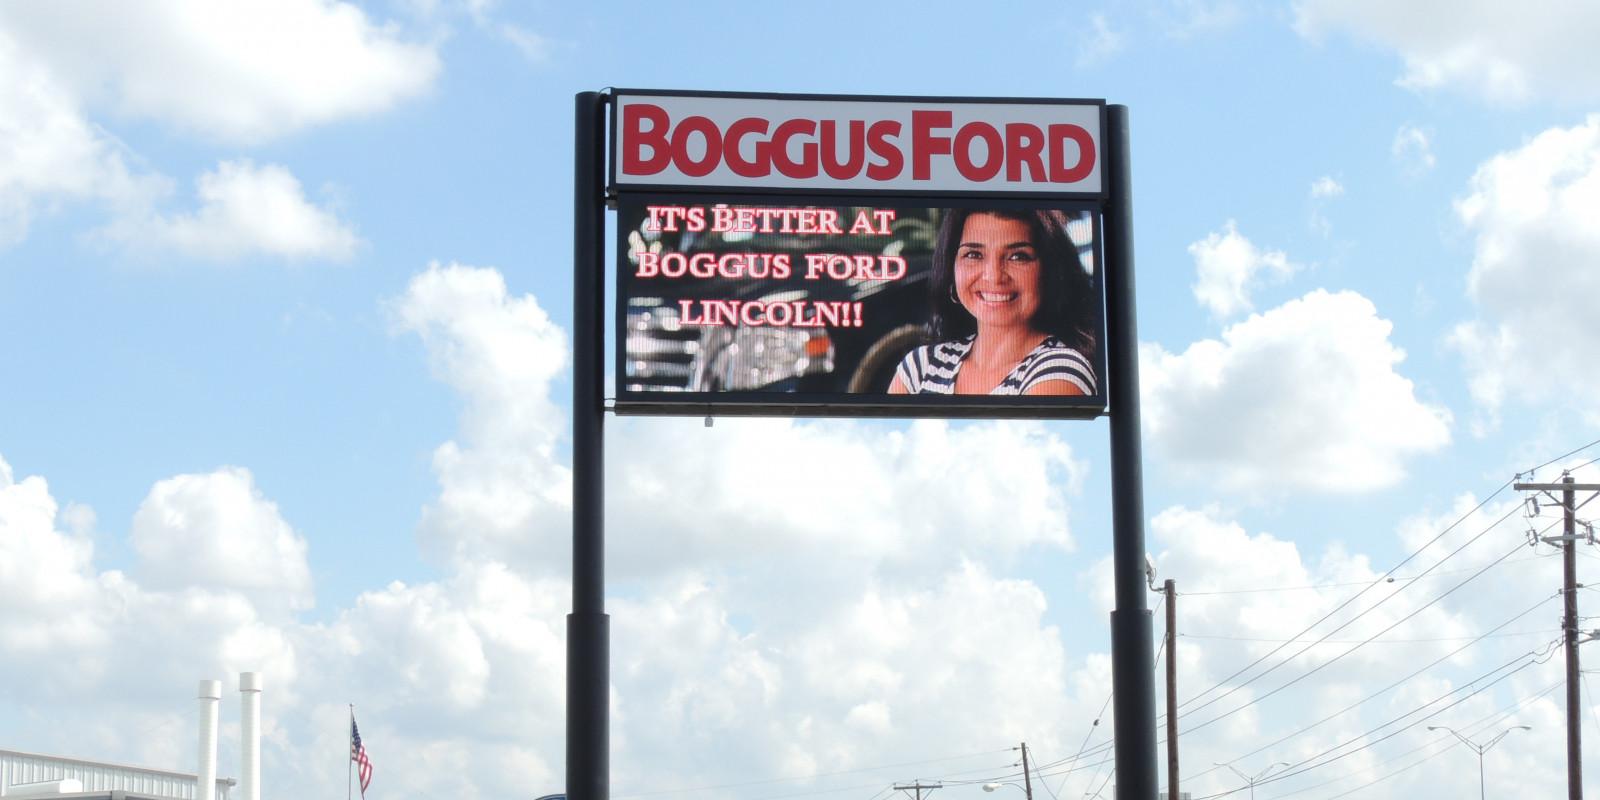 Boggus Ford - McAllen, Texas